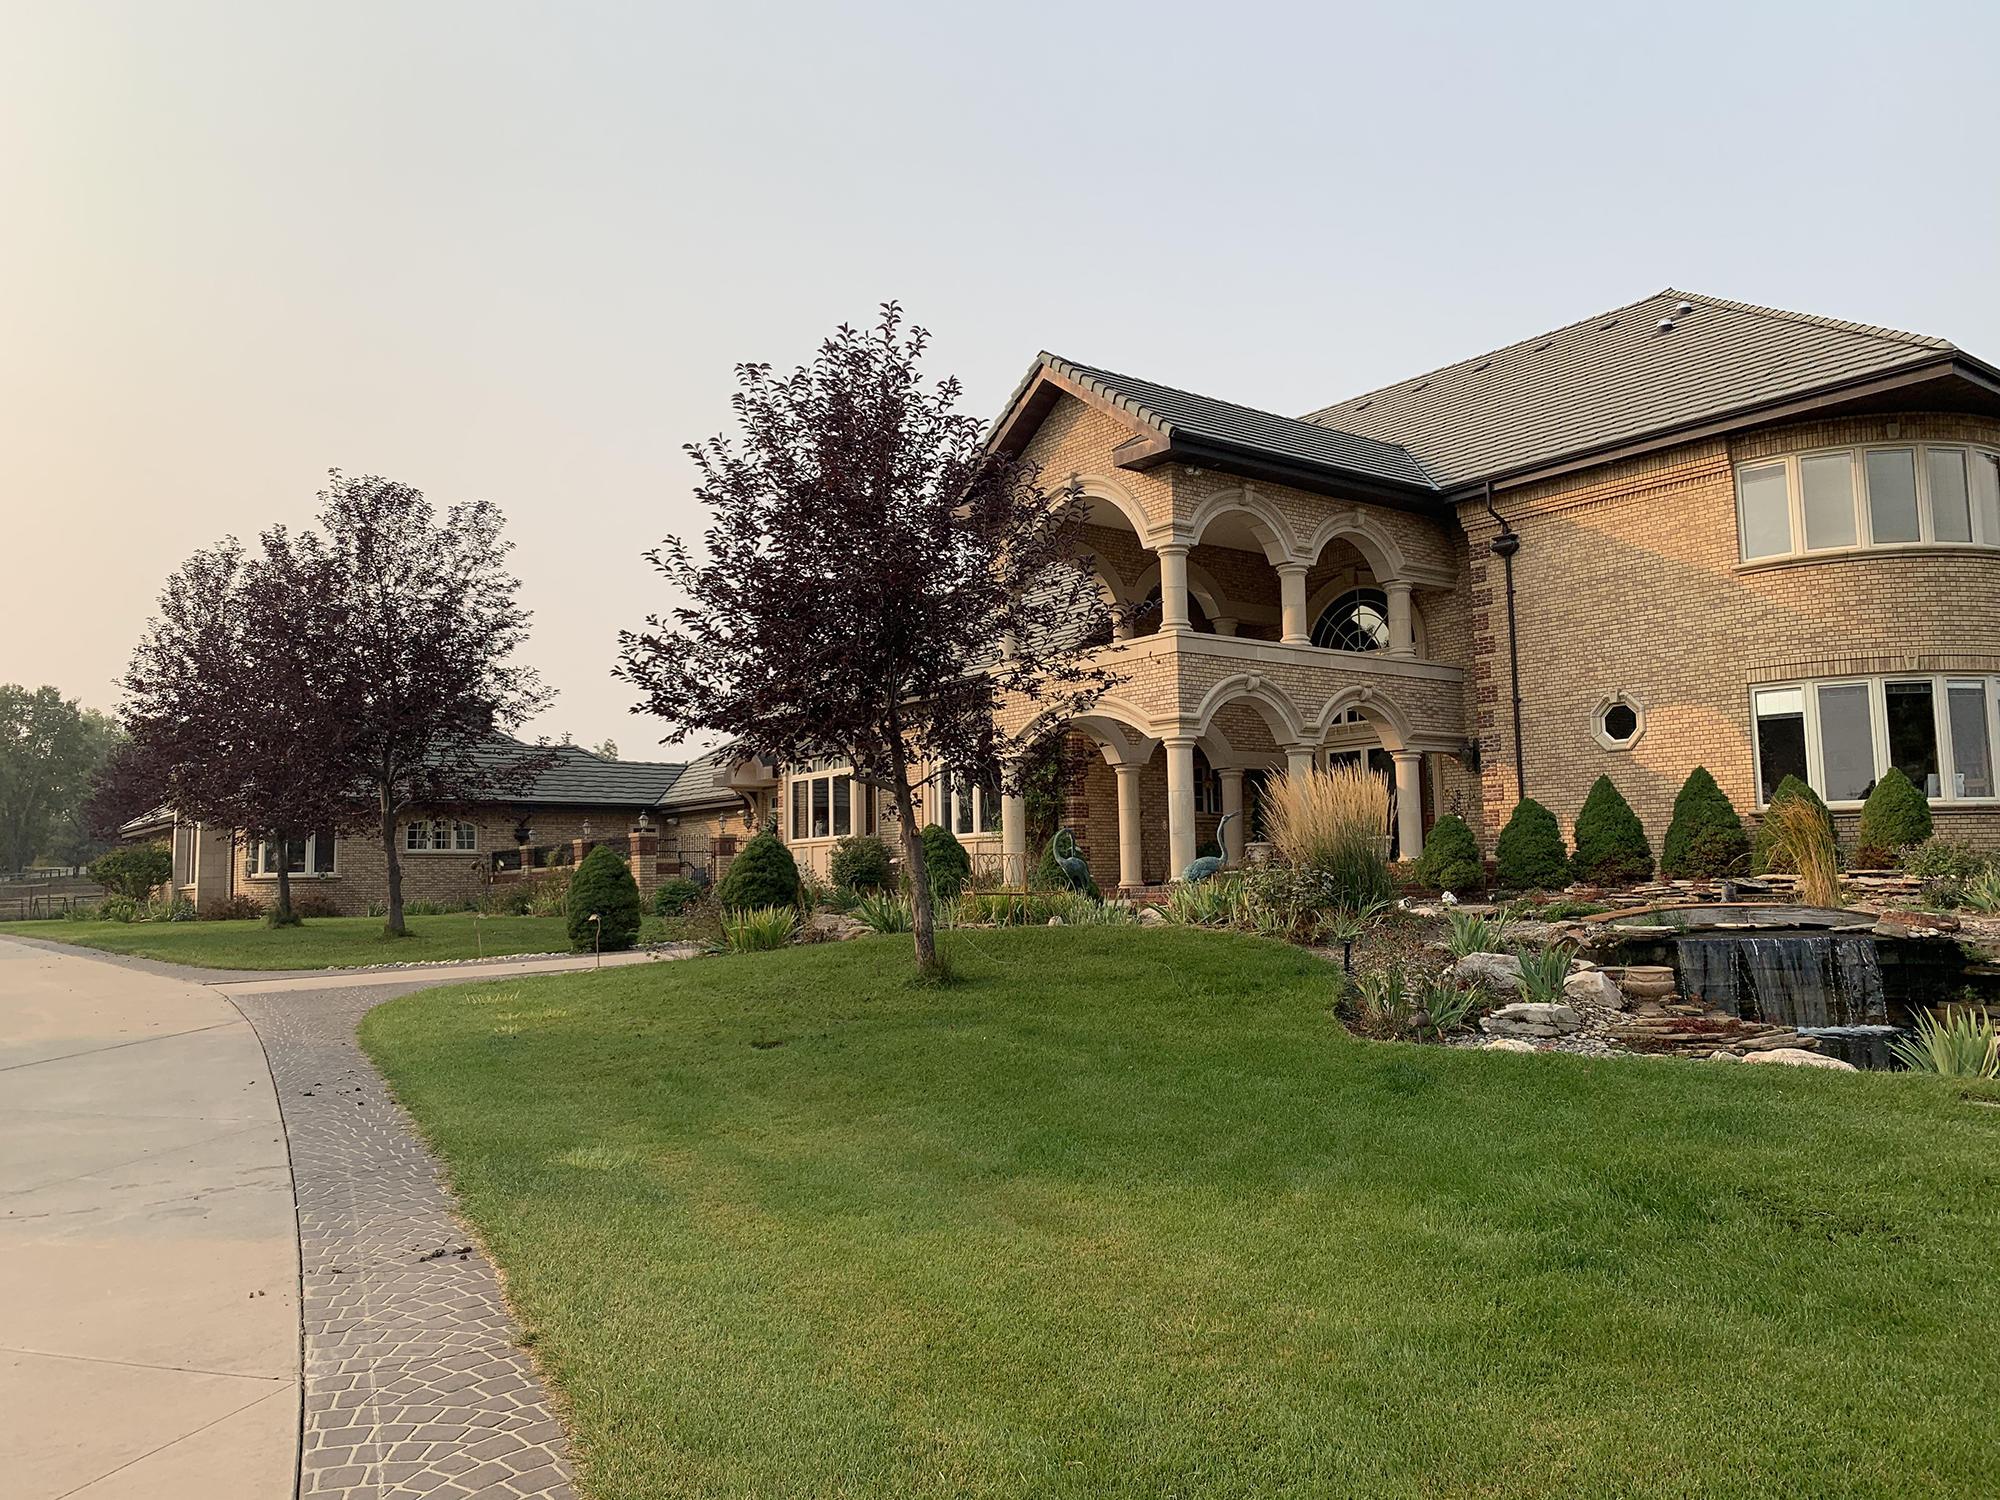 18 Beaver Drive, Sheridan, Wyoming 82801, 7 Bedrooms Bedrooms, ,7 BathroomsBathrooms,Ranch,For Sale,Beaver,19-961